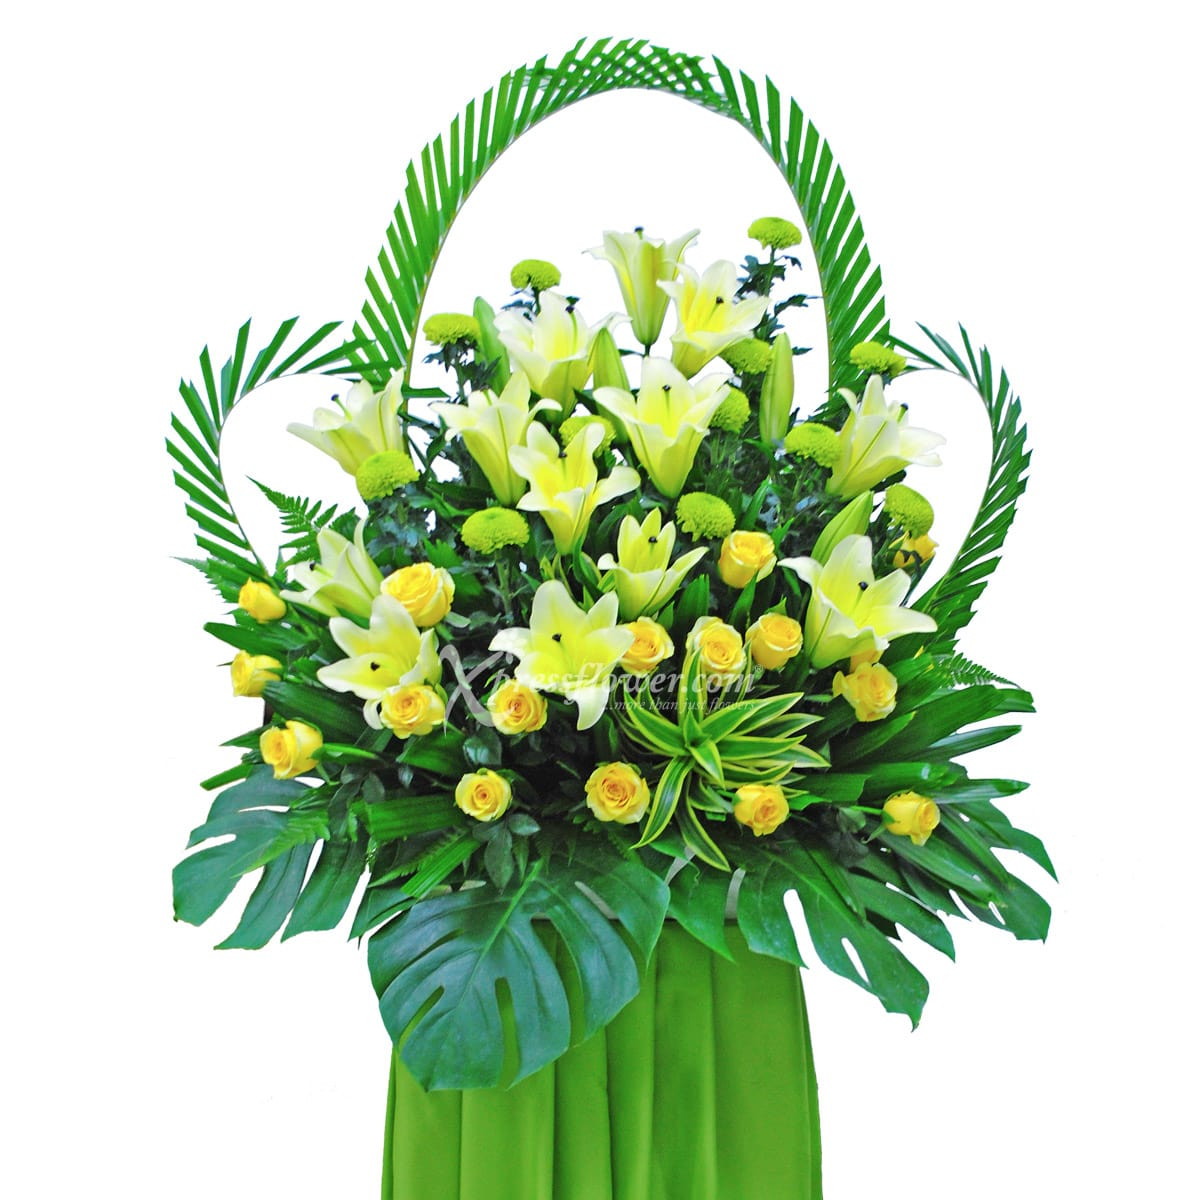 To Live Again (Wreath)